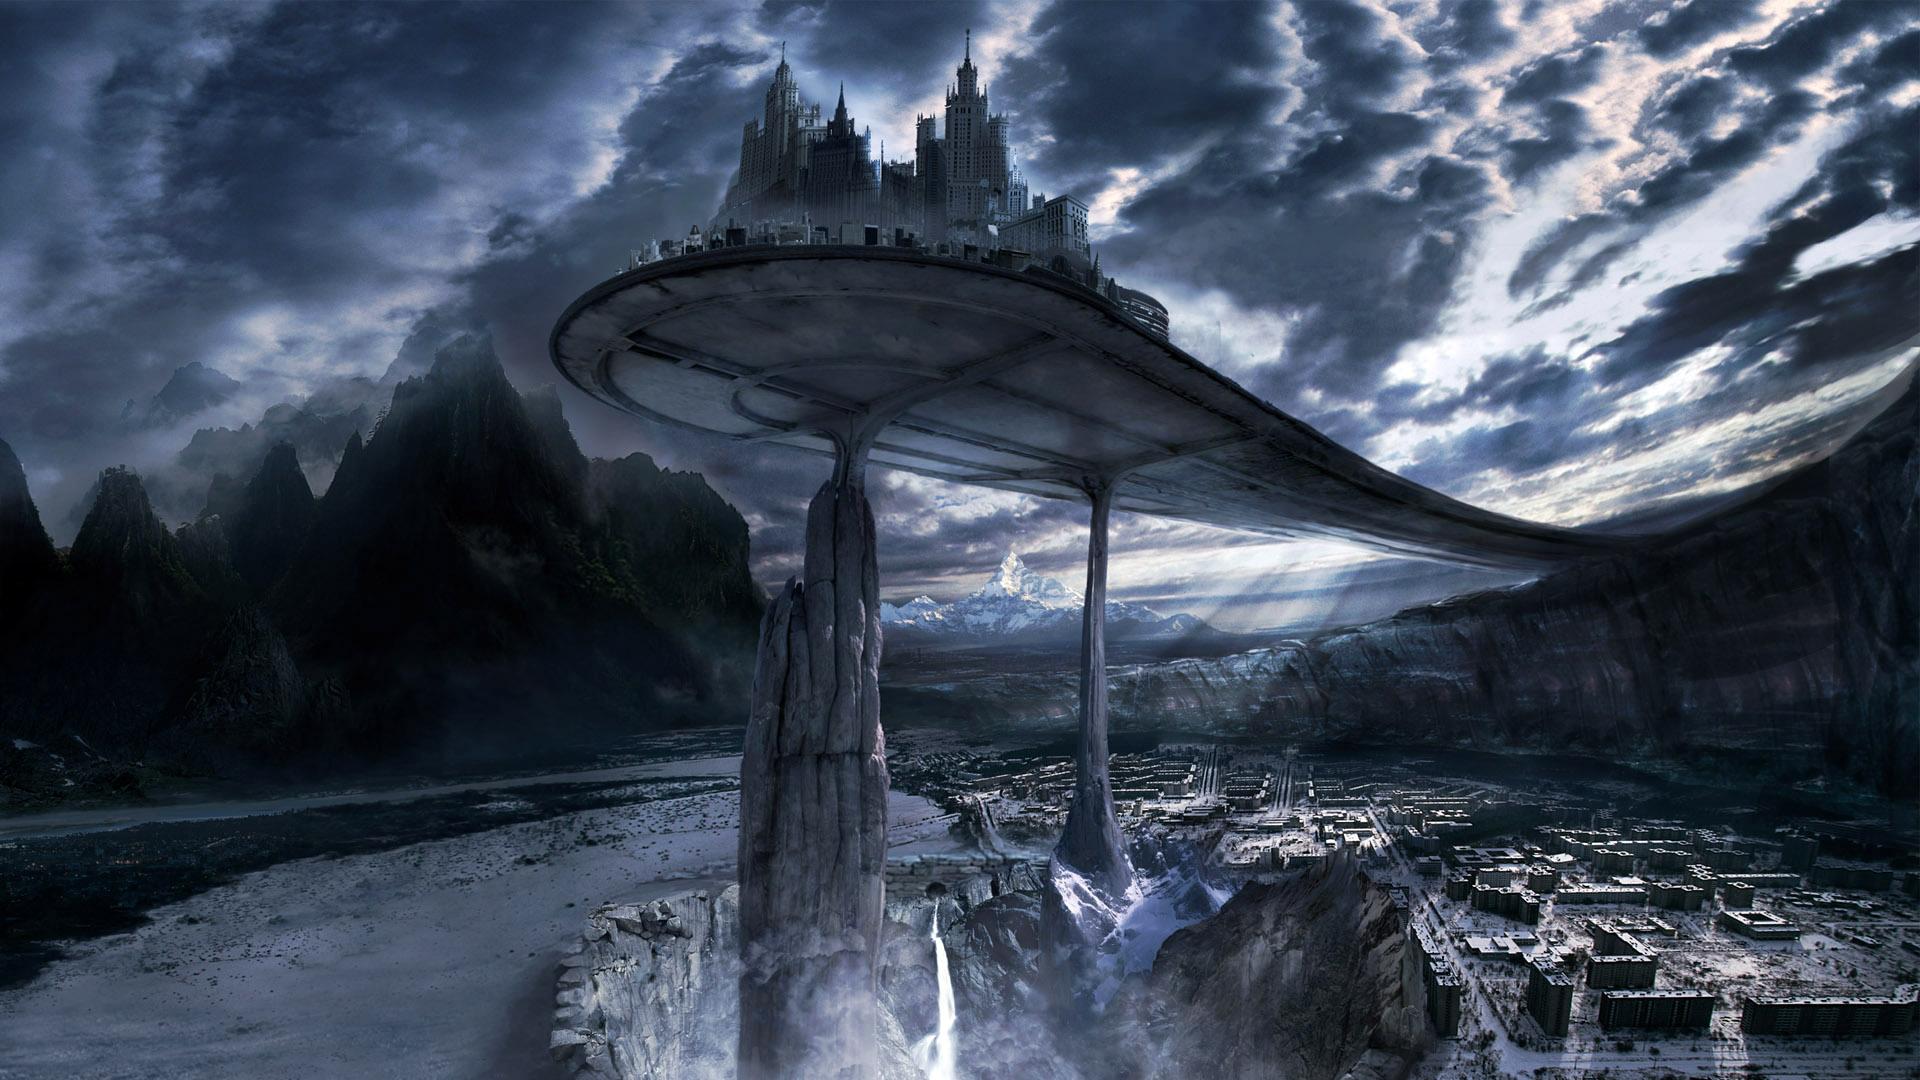 Fantasy World widescreen wallpaper | Wide-Wallpapers NET